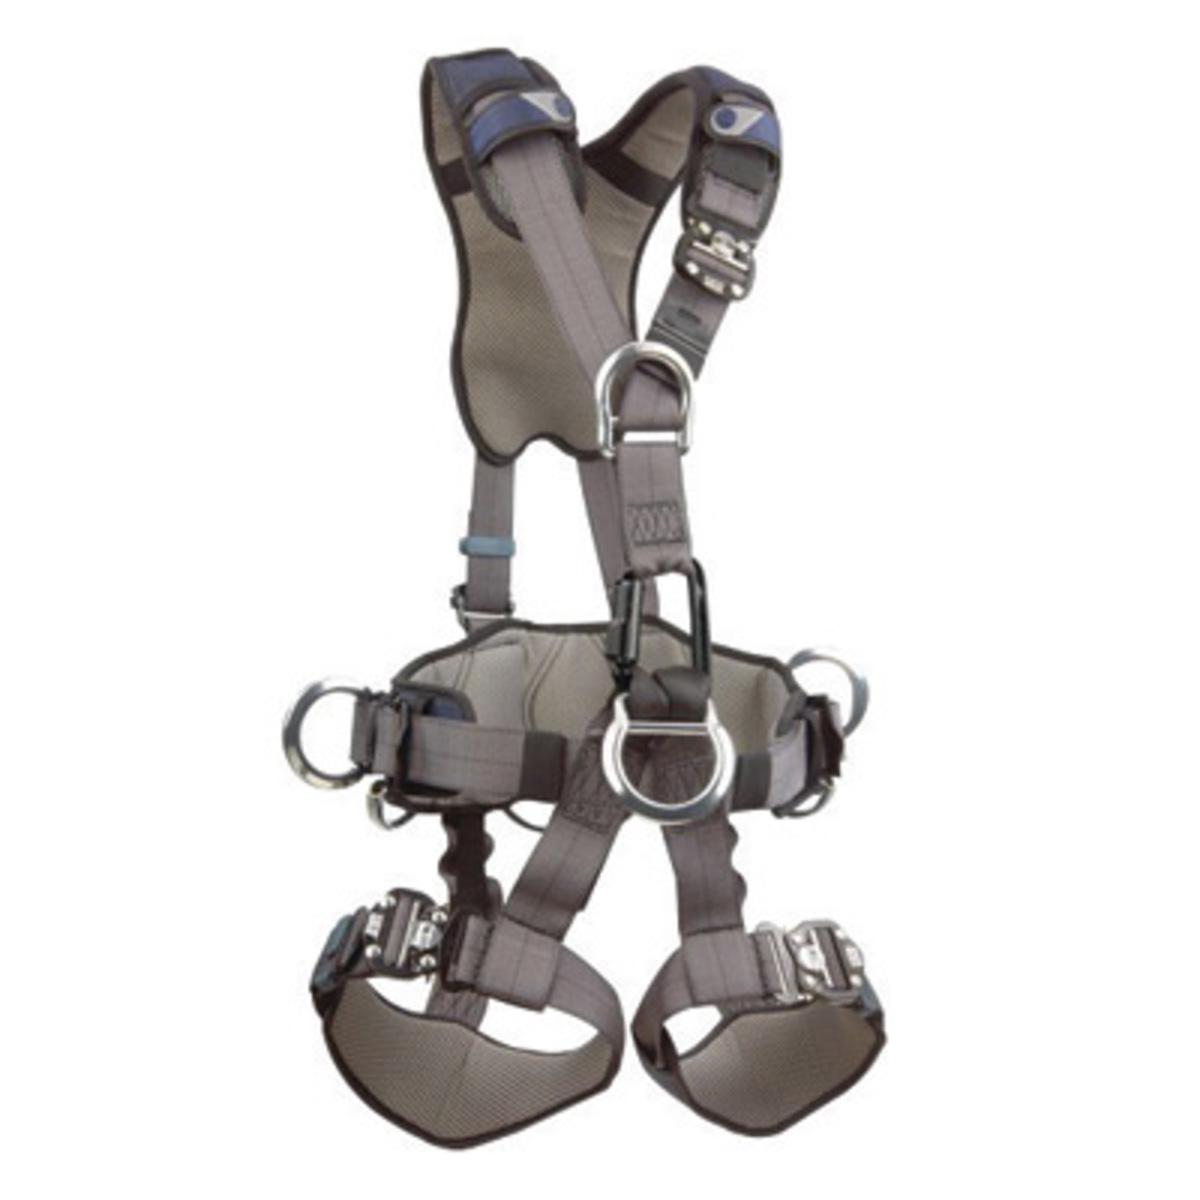 d22b264dd 3M™ DBI-SALA® Large ExoFit™ XP Construction Full Body Vest